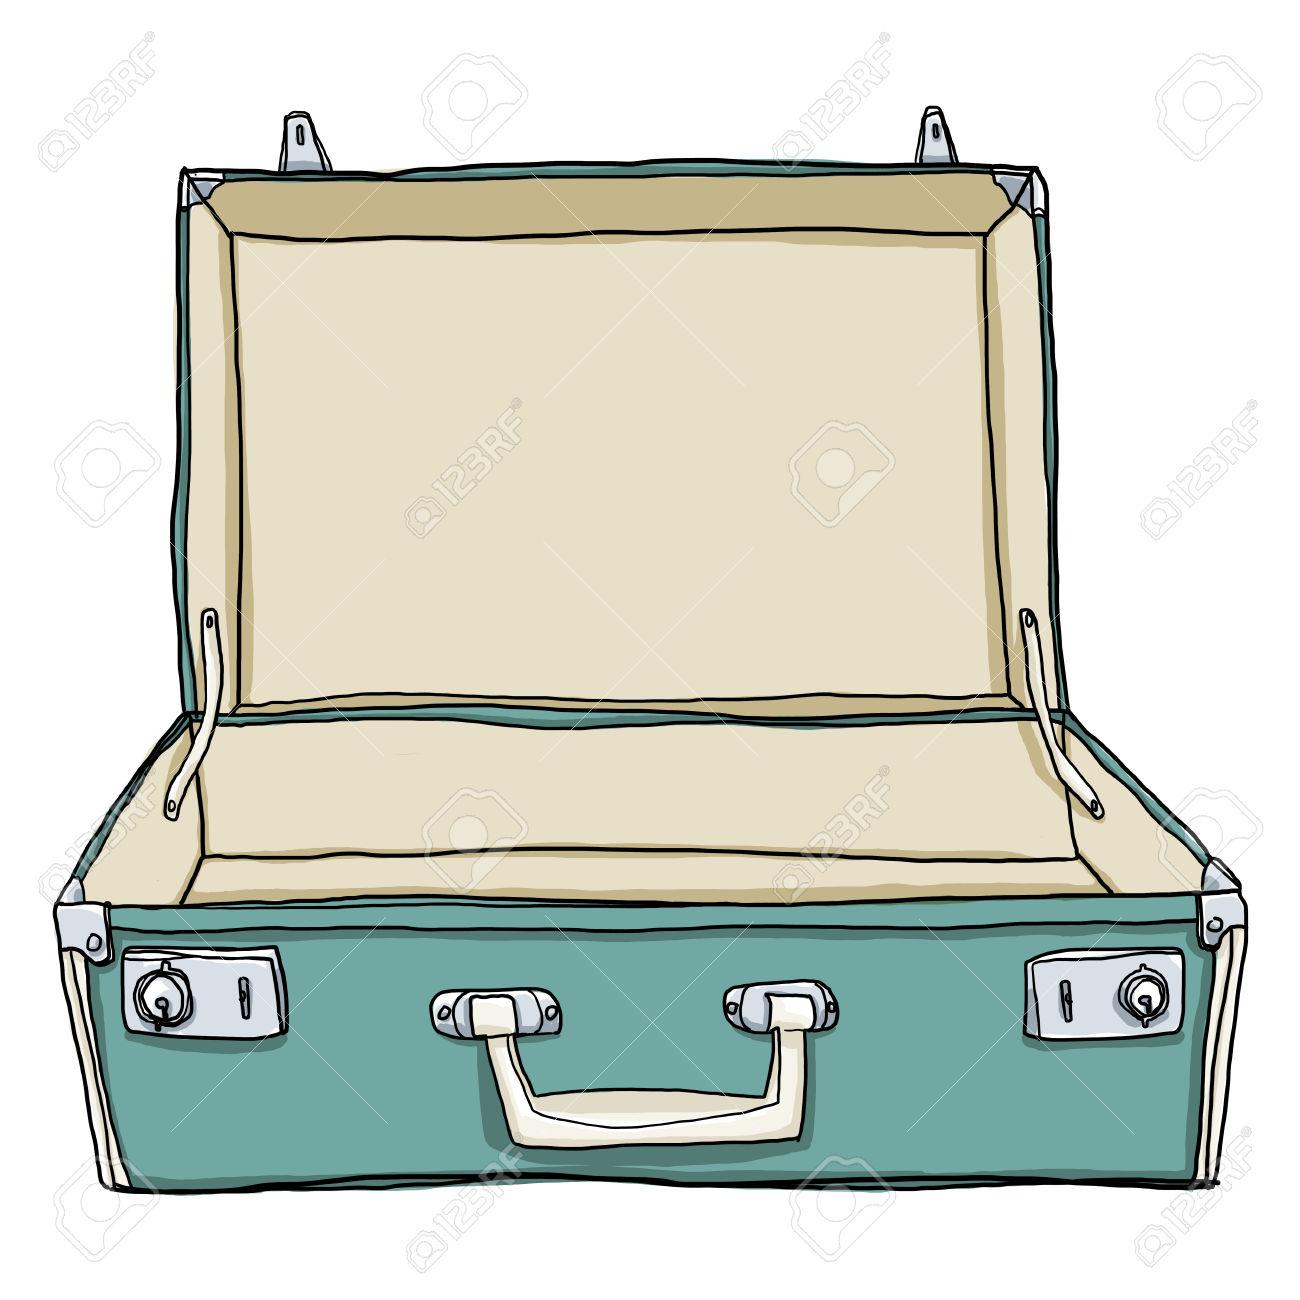 open suitcase clipart free download best open suitcase clipart on rh clipartmag com open suitcase images clipart Suitcase Vector